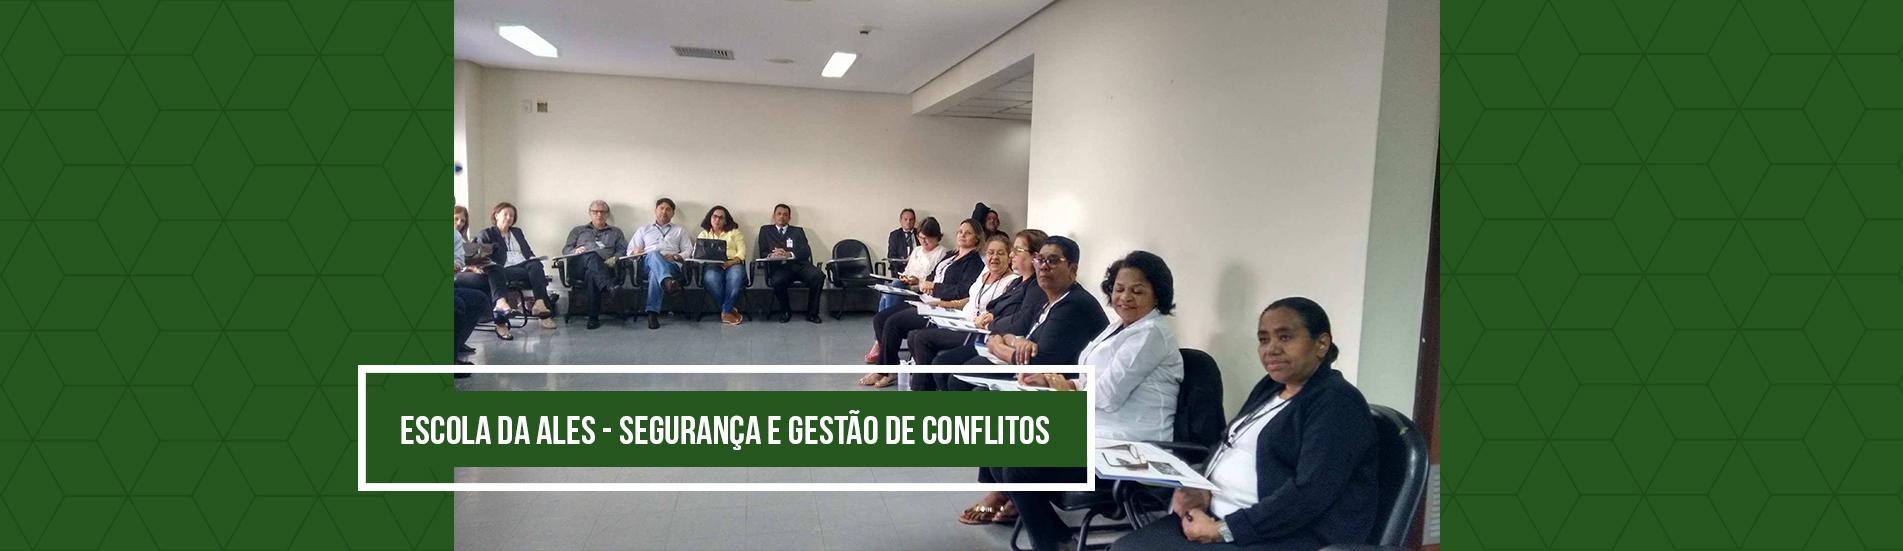 Banner_ABEL_Escola_da_ALES